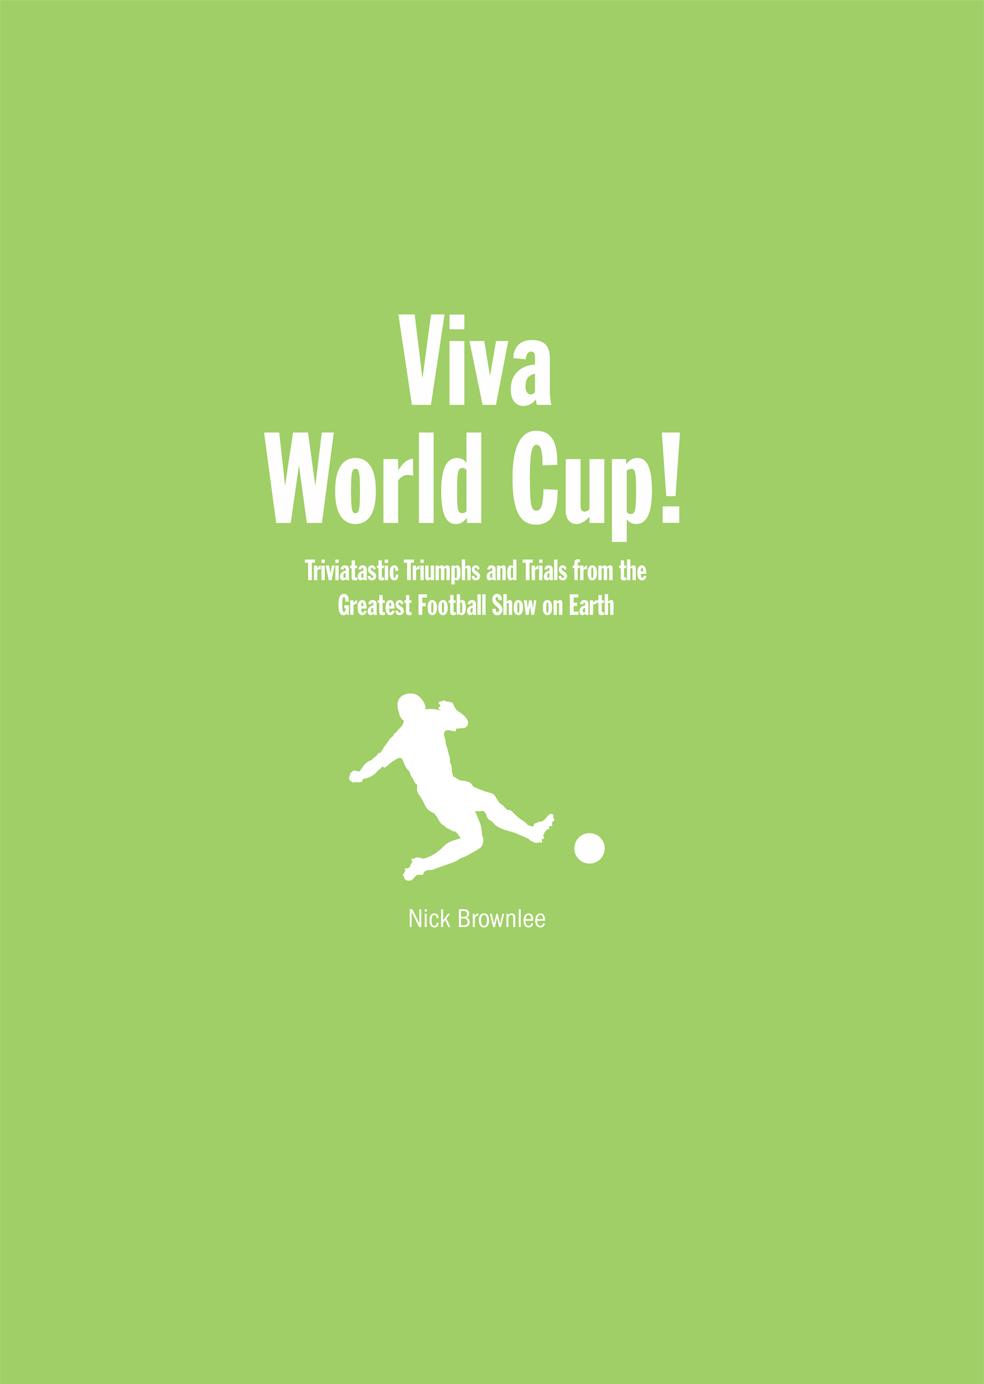 Viva World Cup!